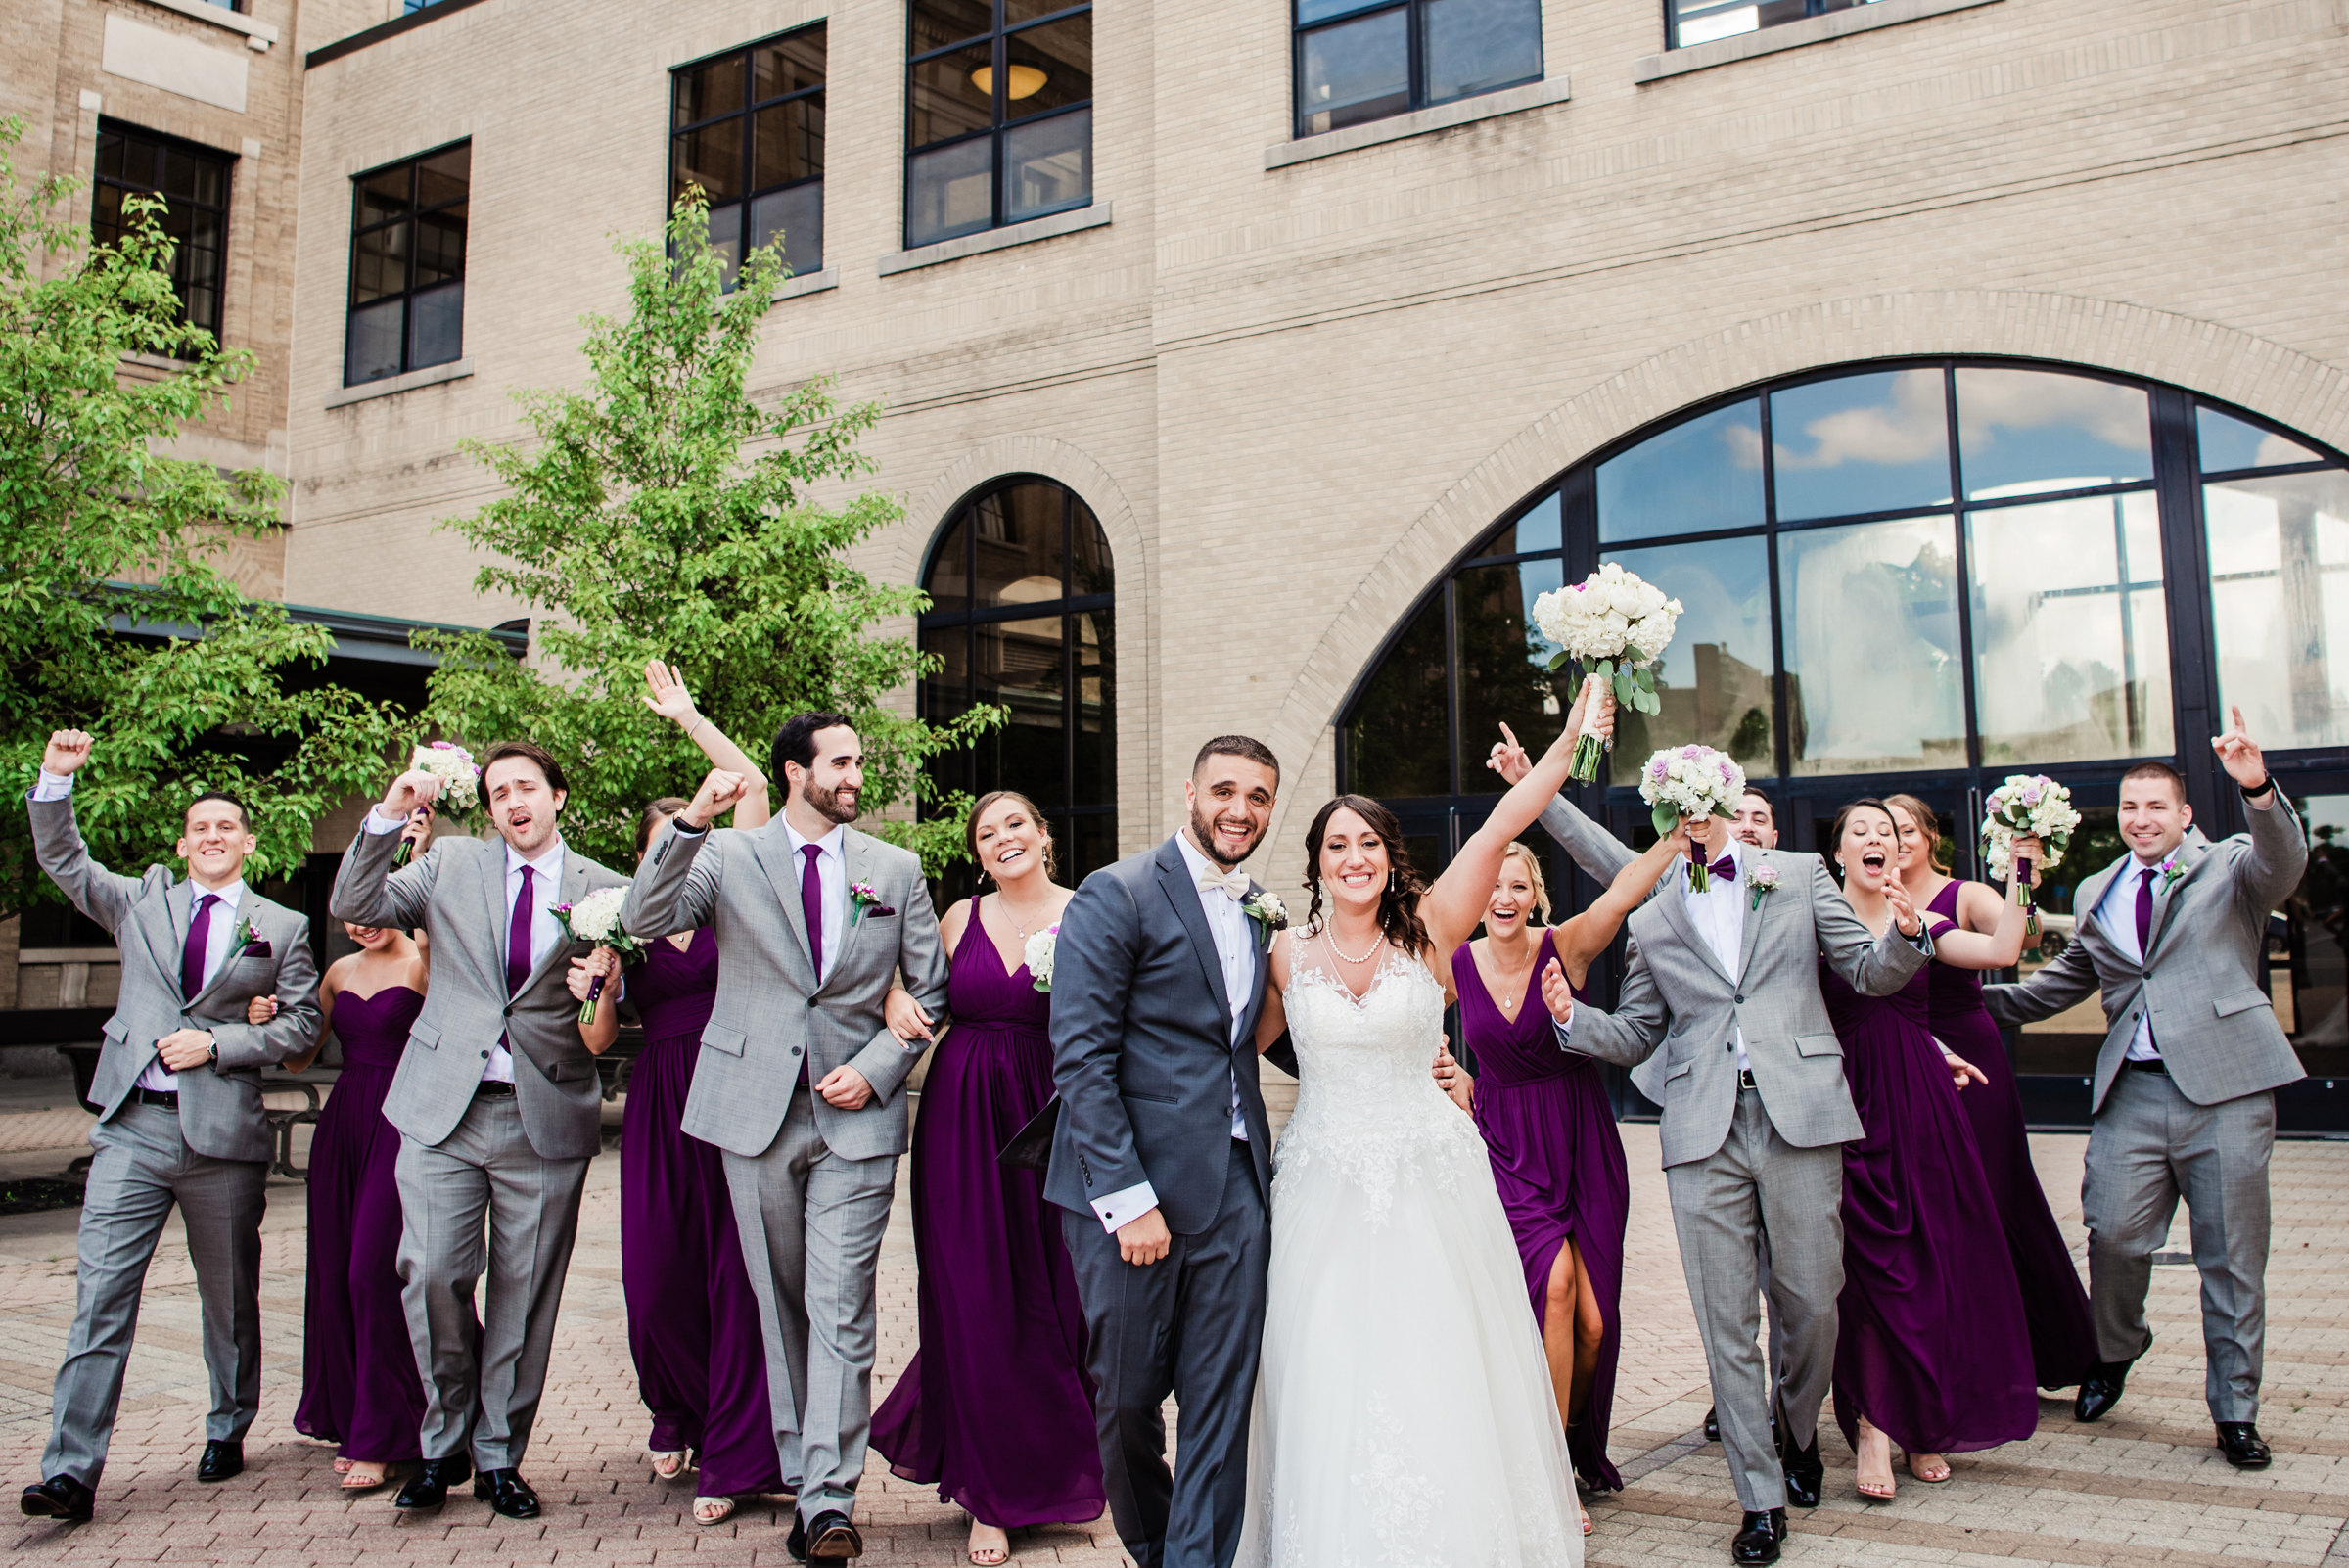 Historic_Old_St_Johns_Church_Valentinos_Banquet_Hall_Central_NY_Wedding_JILL_STUDIO_Rochester_NY_Photographer_DSC_6299.jpg